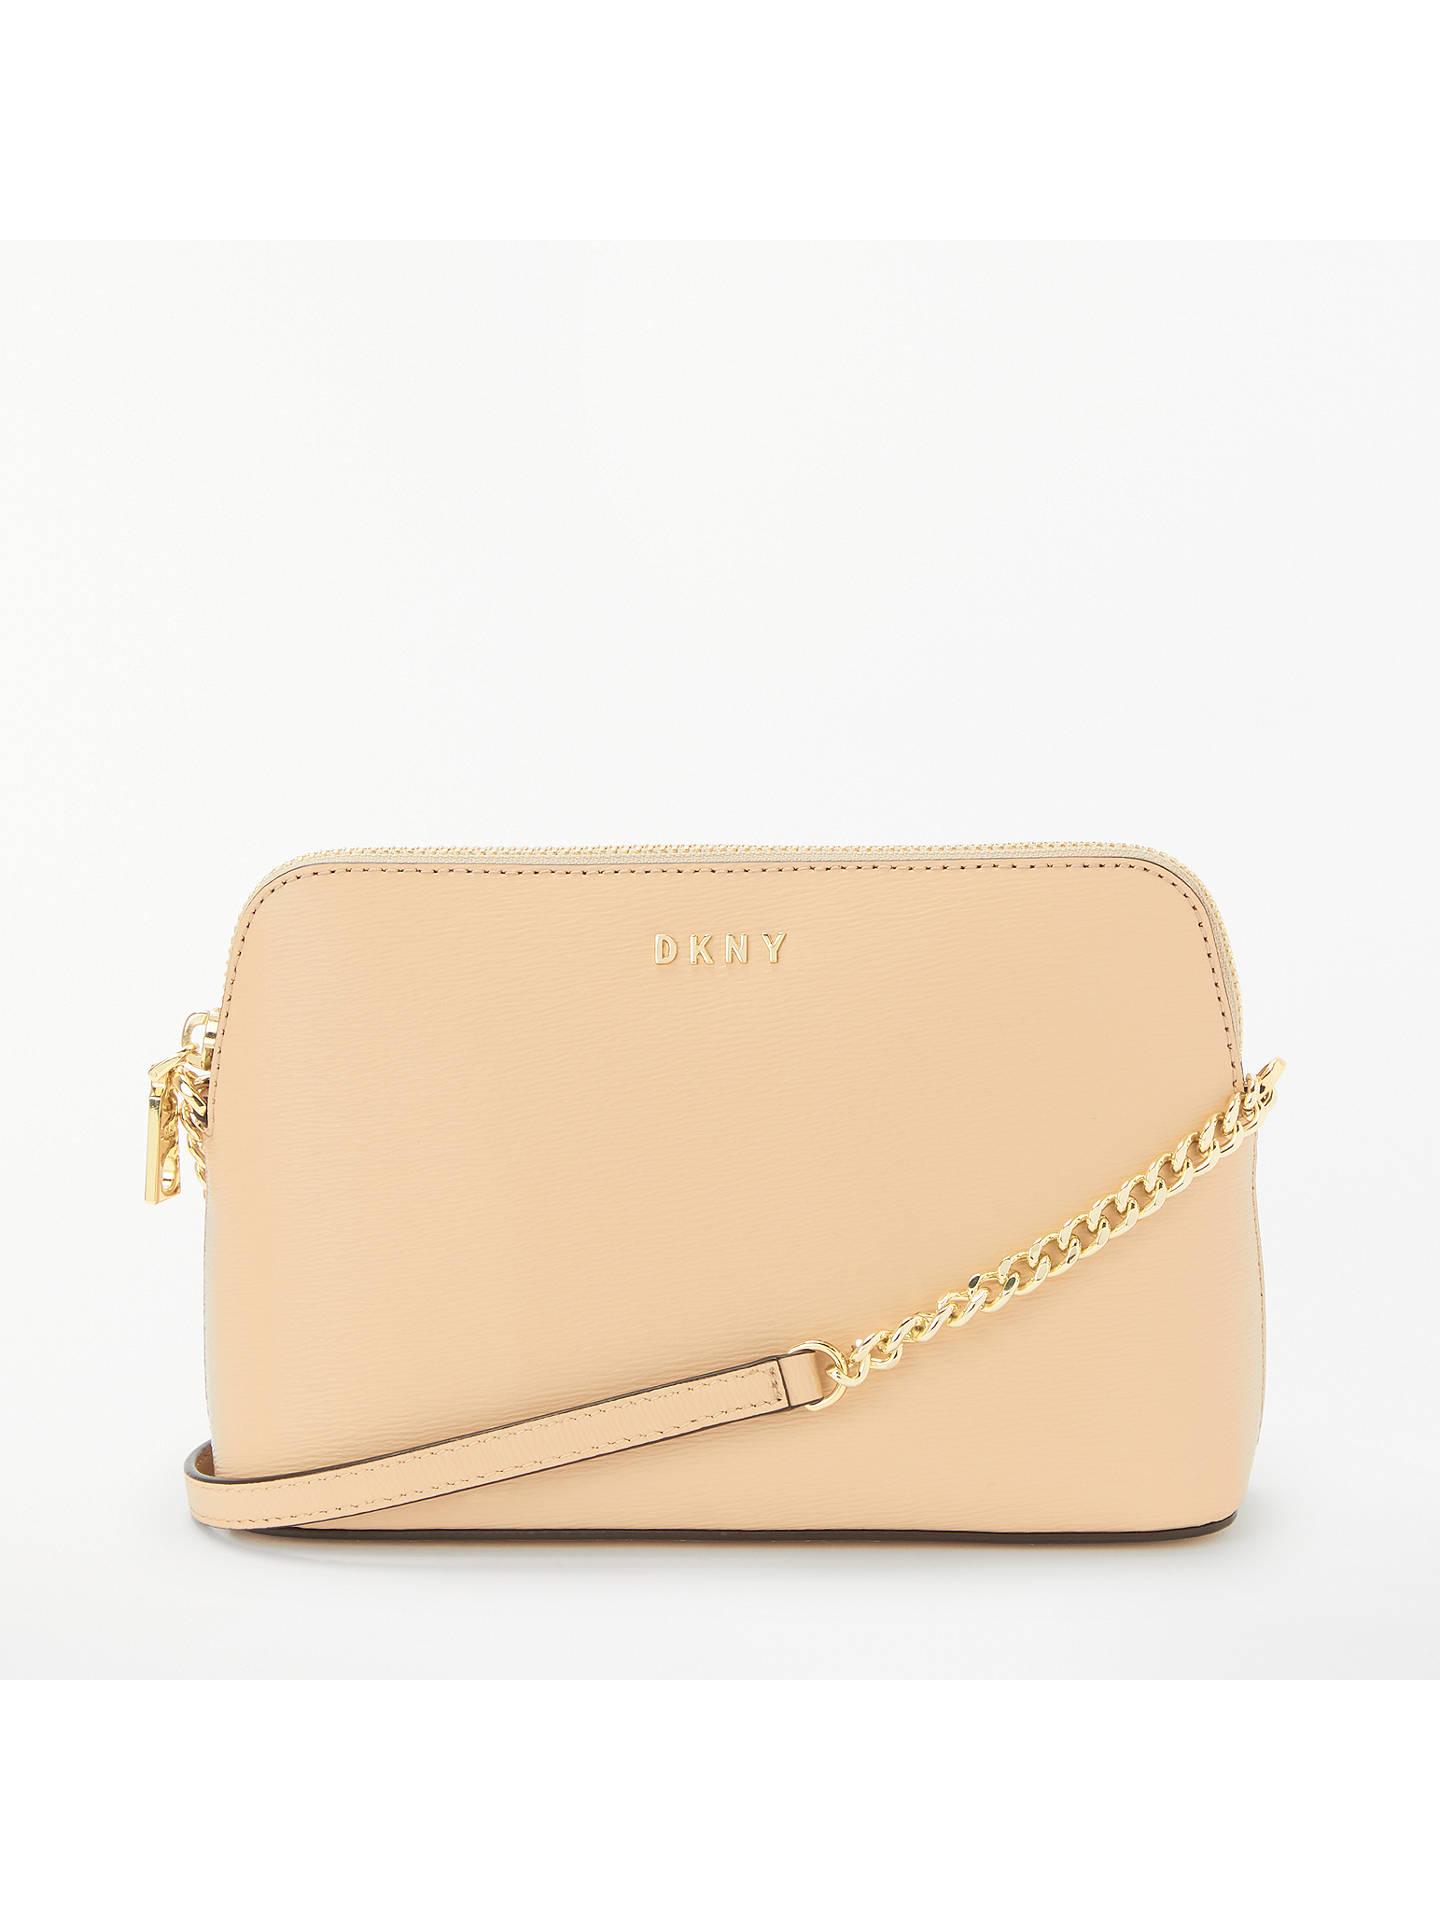 9623d6035 Buy DKNY Bryant Top Zip Cross Body Bag, Eggnog Online at johnlewis.com ...